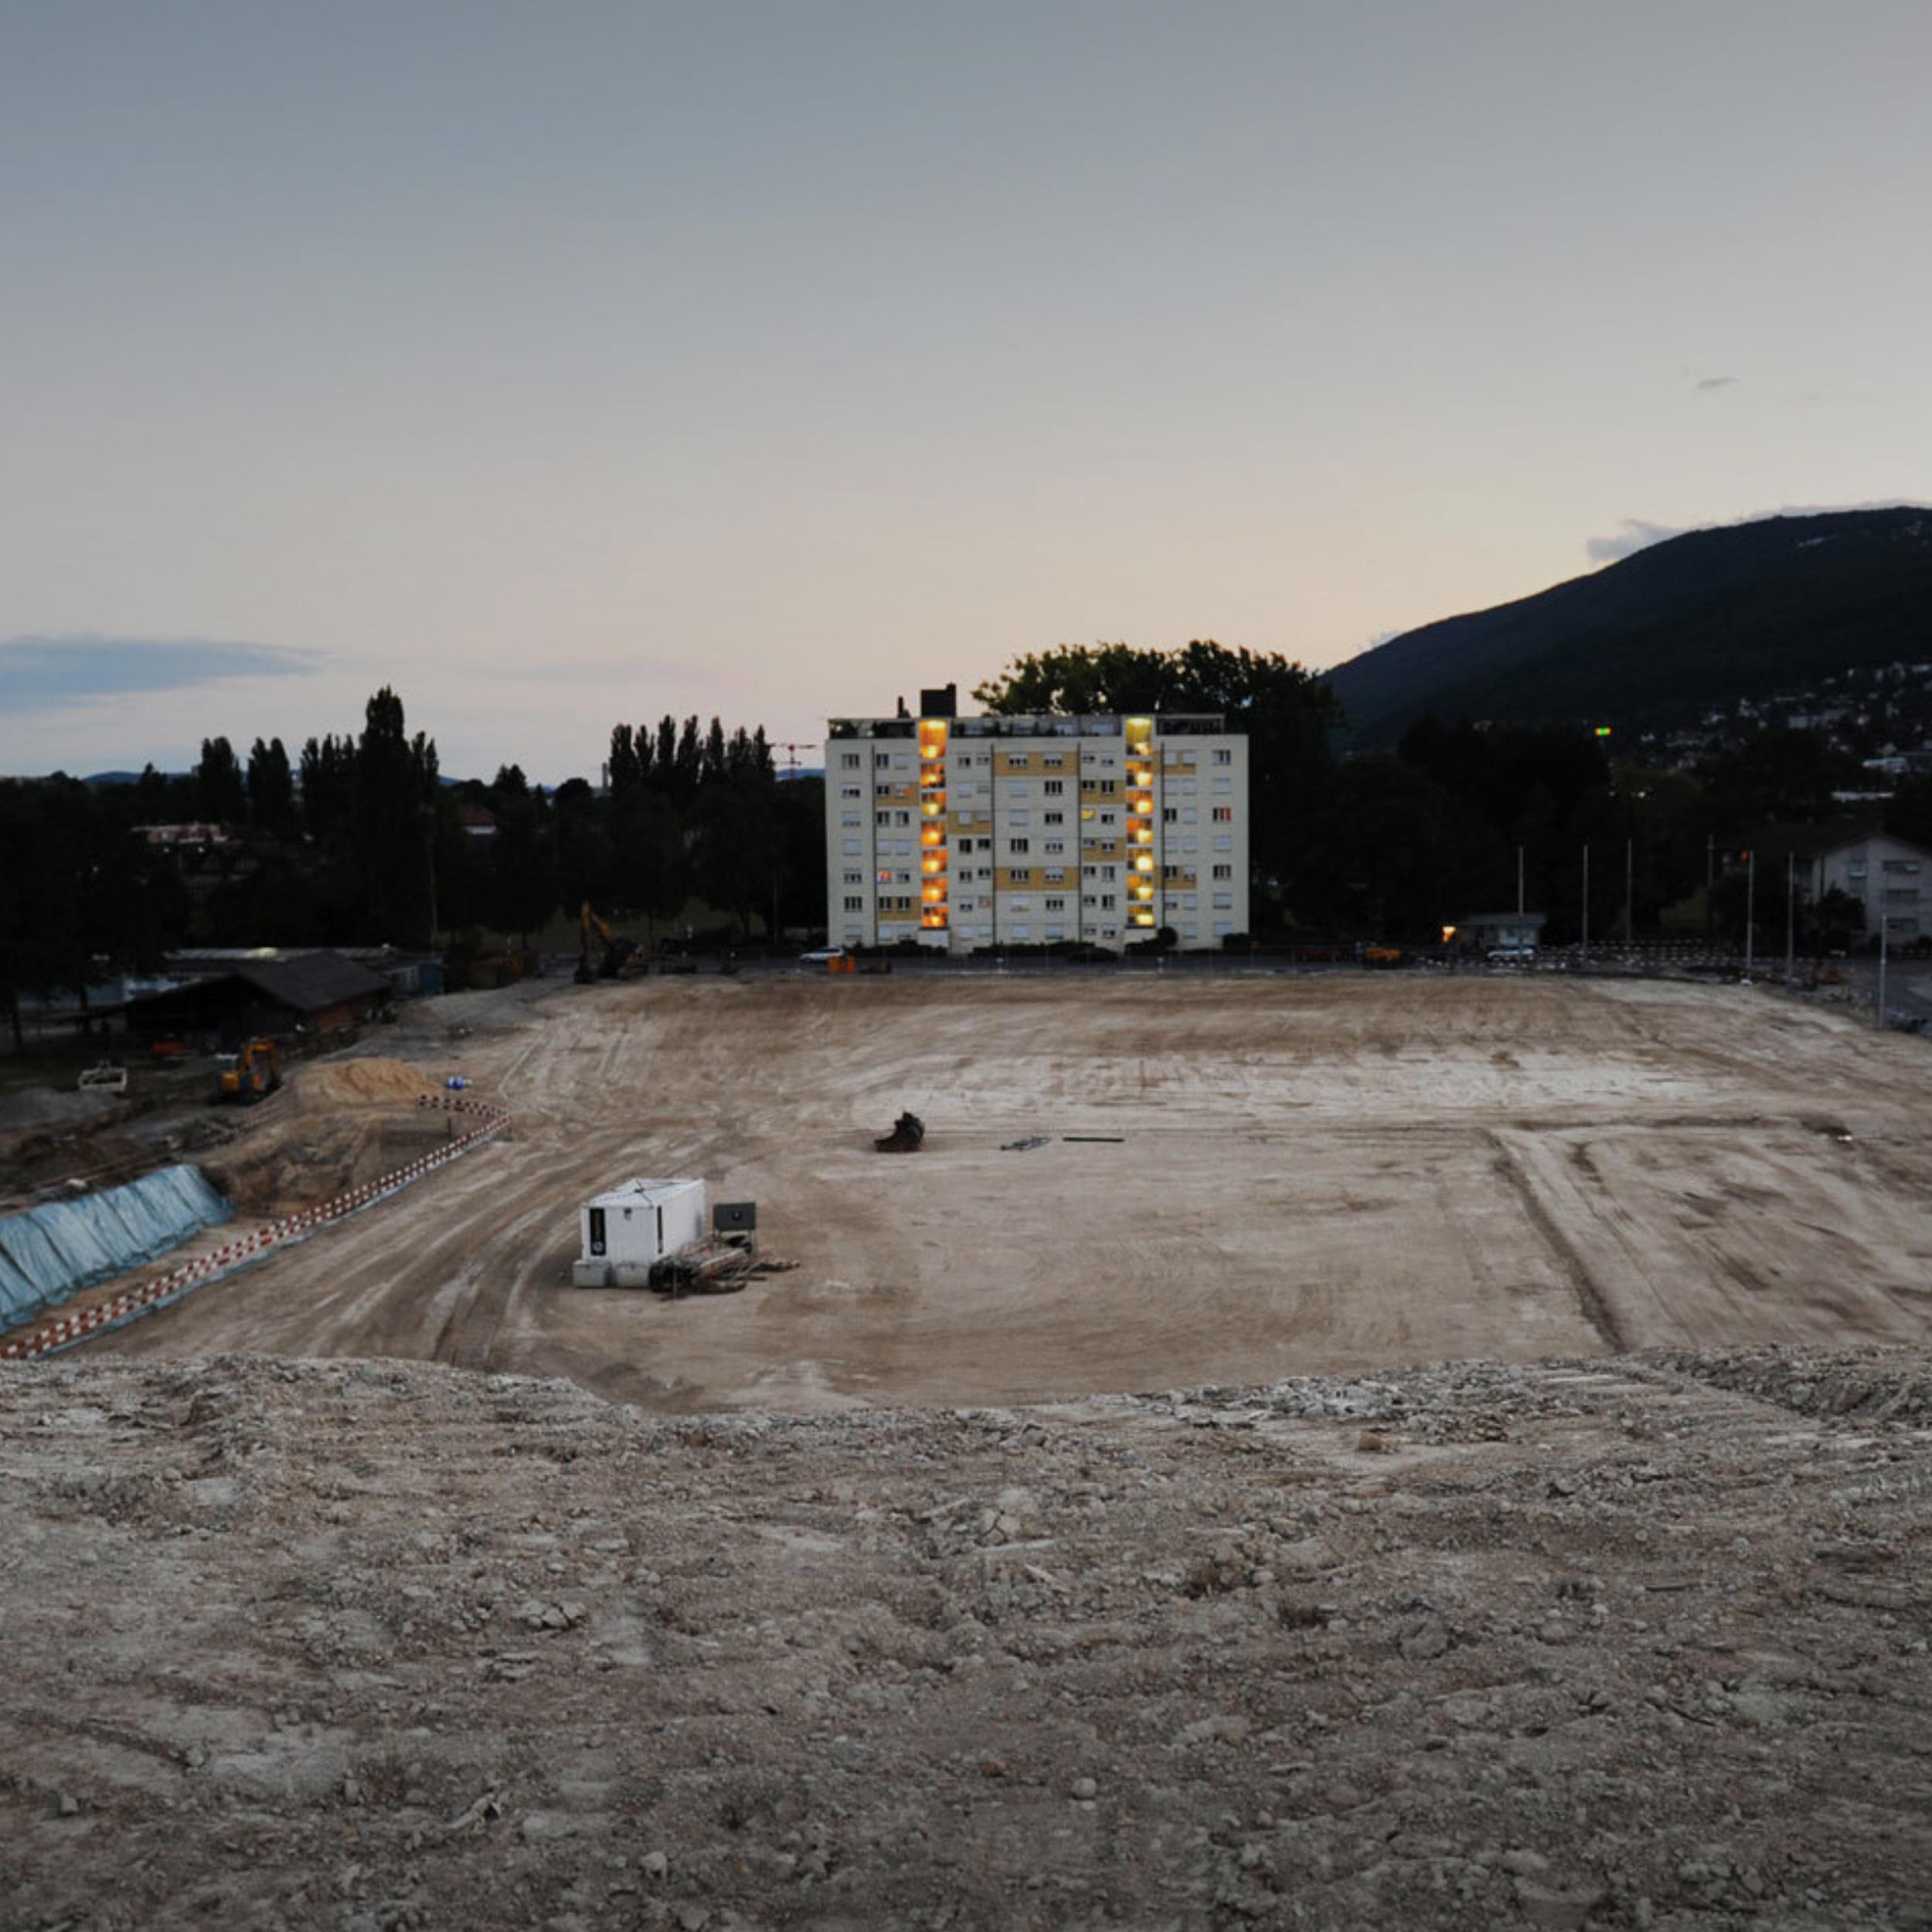 Carmelaodoni Overview